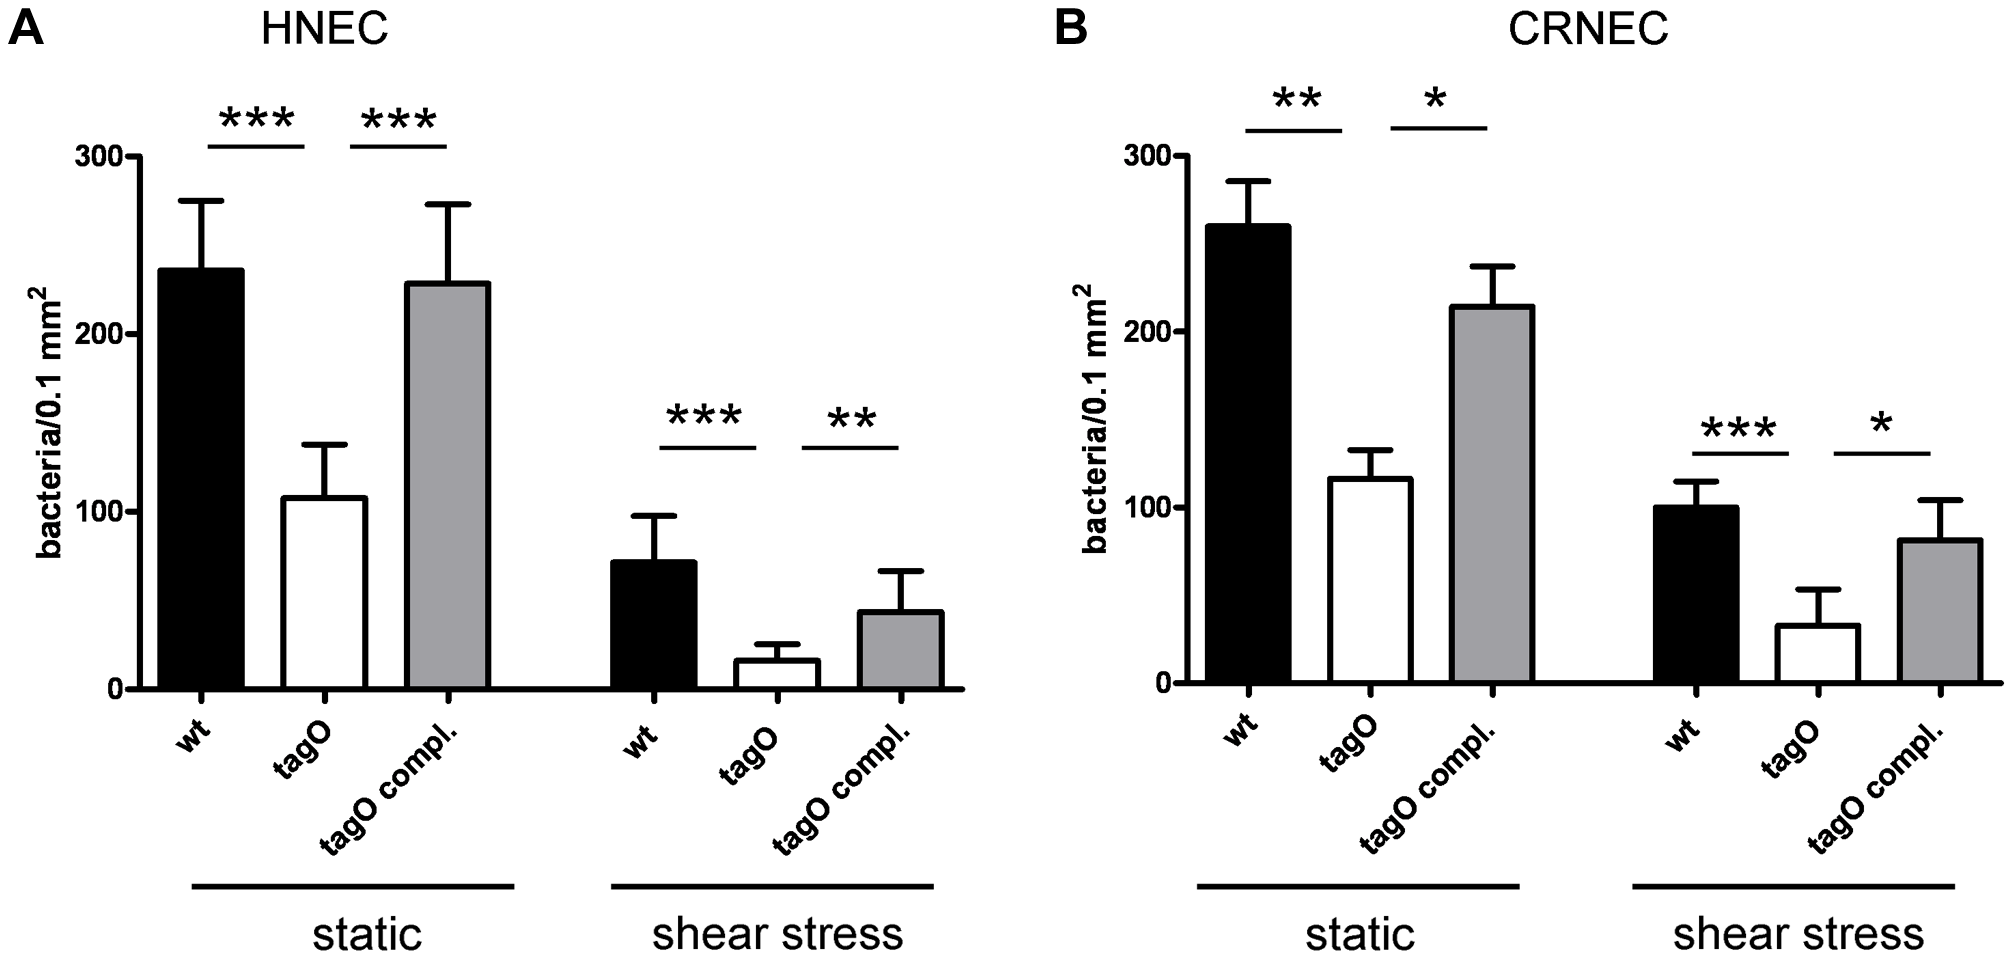 WTA-mediated adhesion of <i>S. aureus</i> to HNECs and CRNECs.